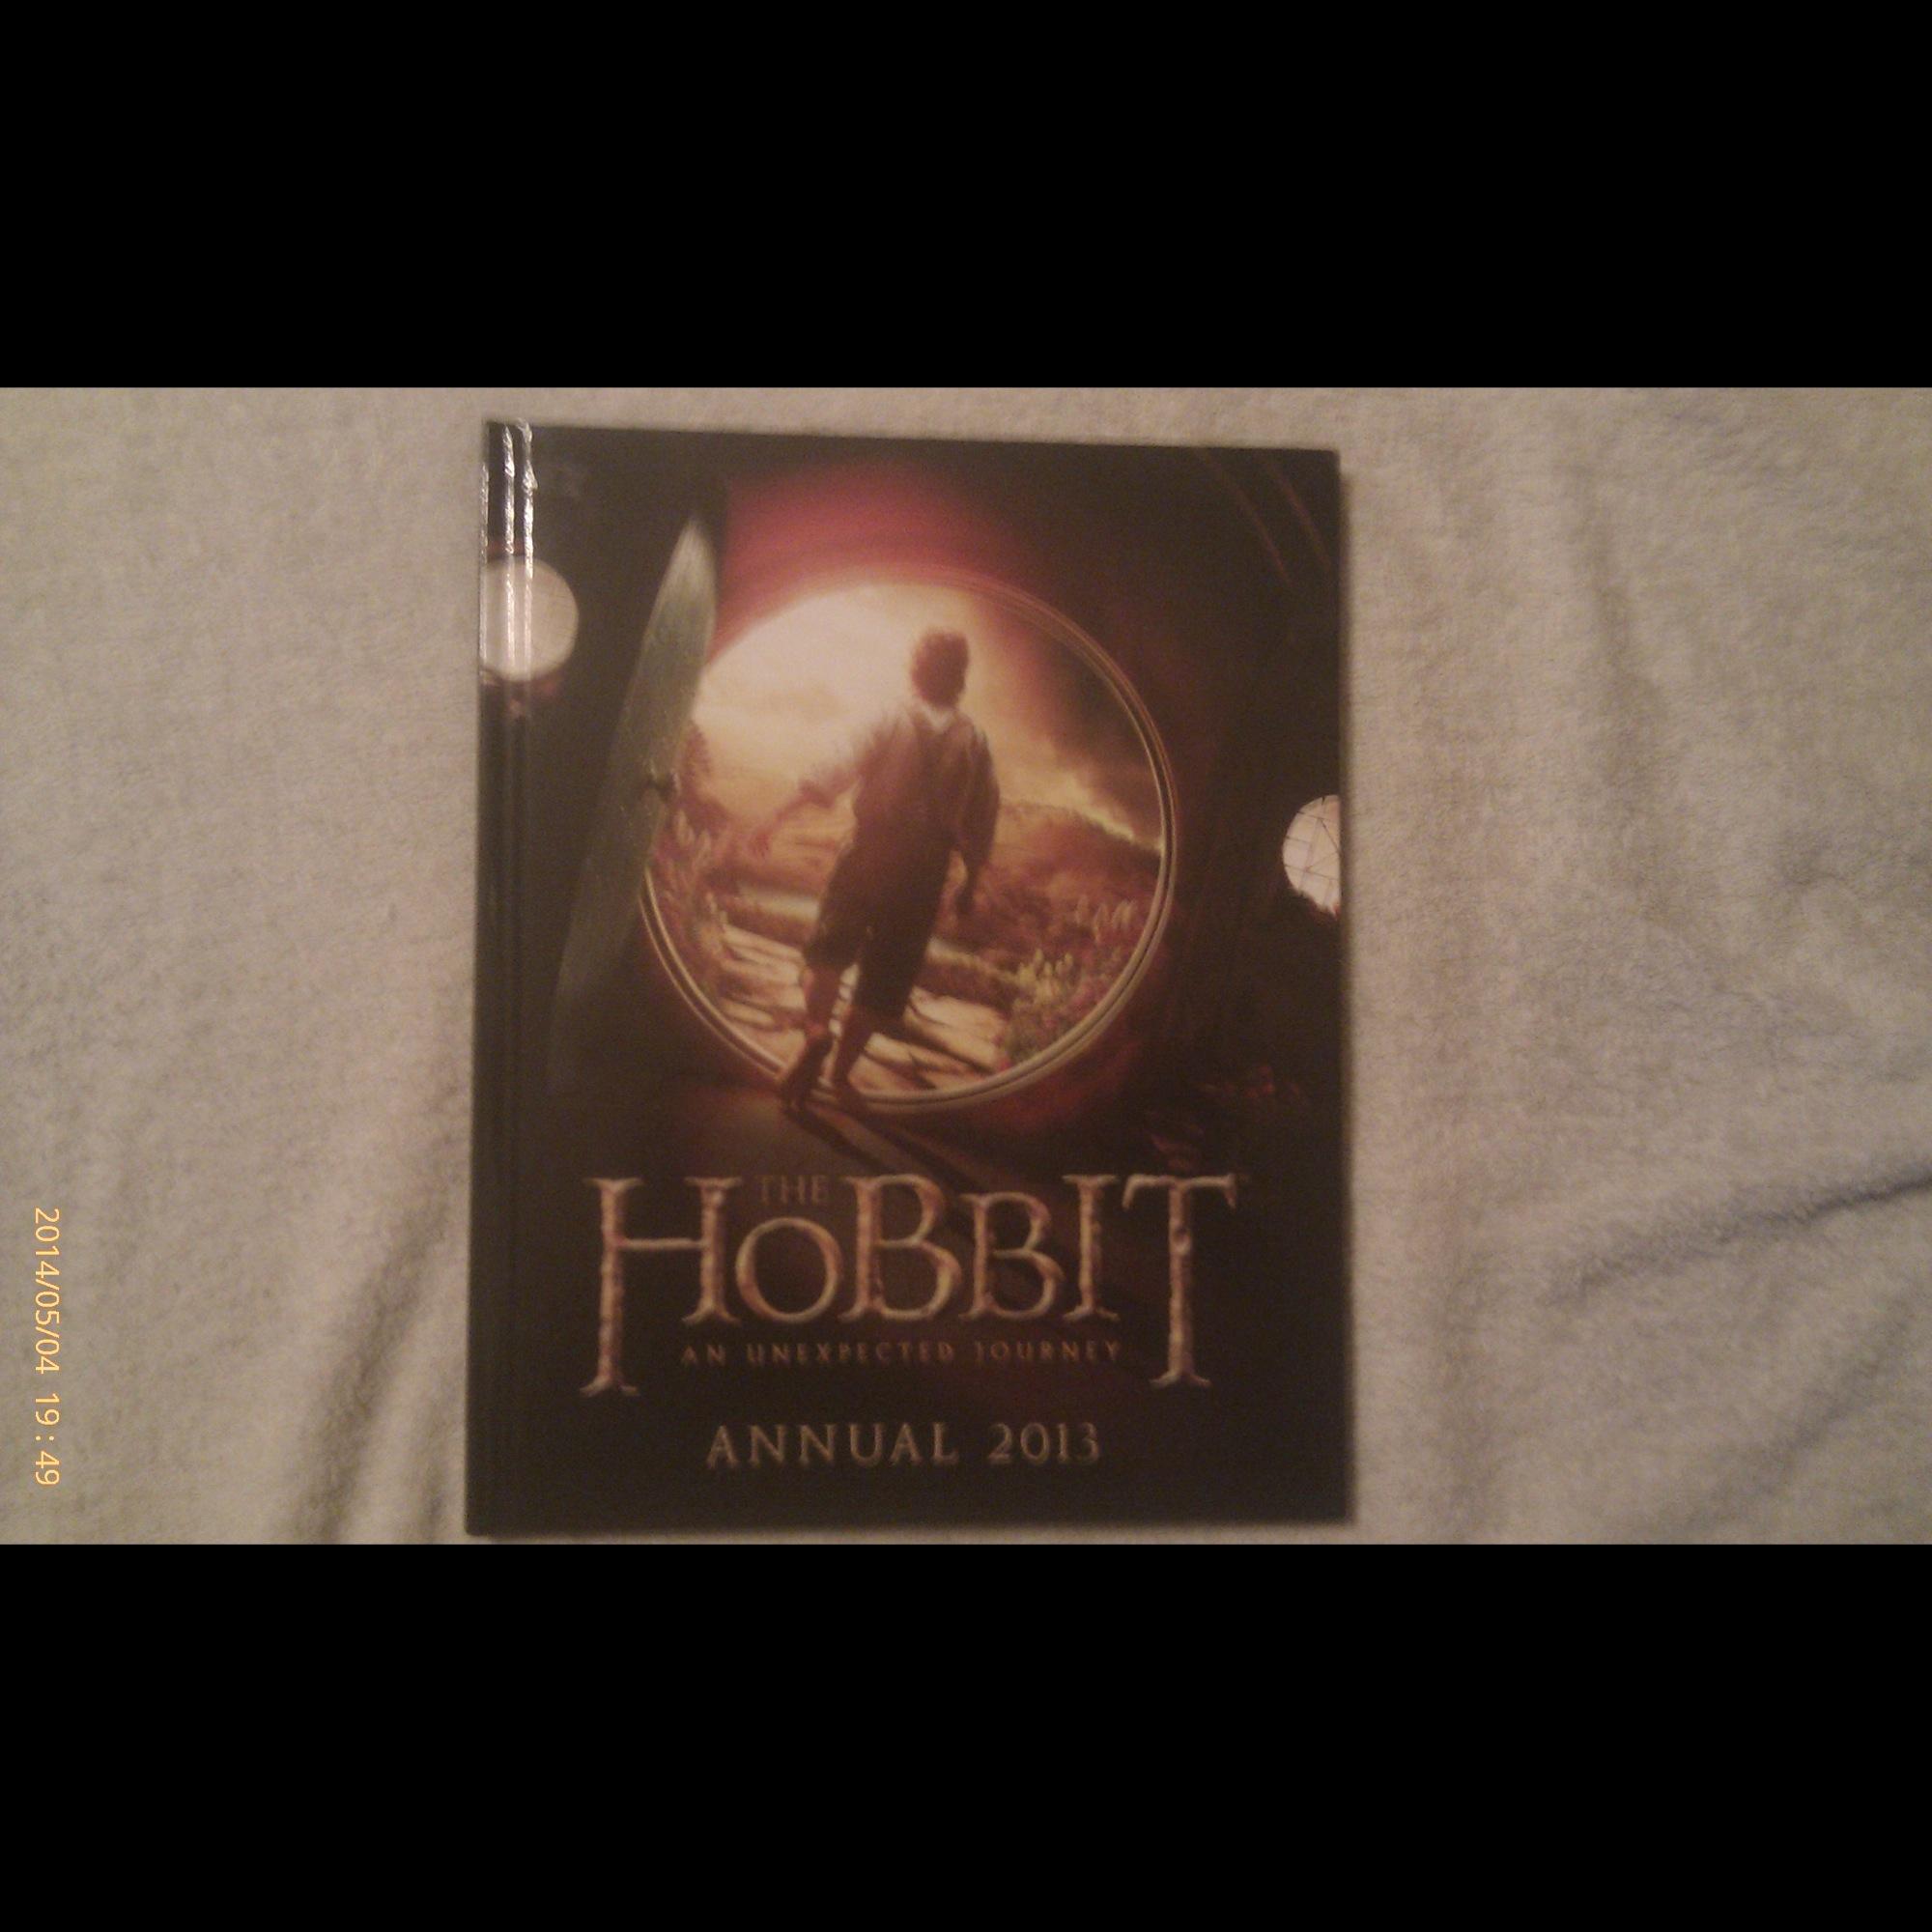 The Hobbit Annual 2013